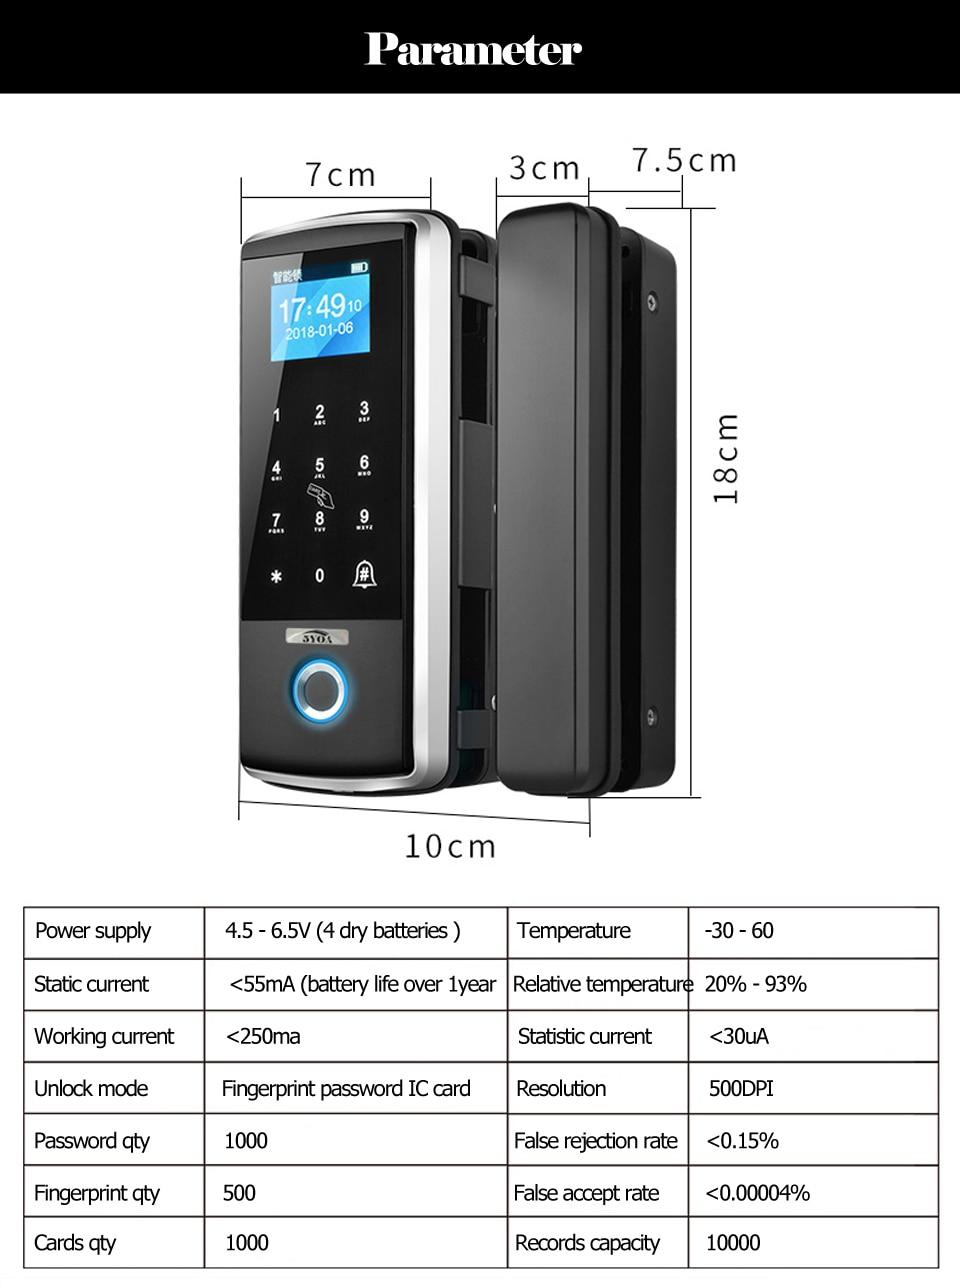 HTB1.hyad21G3KVjSZFkq6yK4XXaa Smart Door Fingerprint Lock Electronic Digital Gate Opener Electric RFID Biometric finger print security Glass Password Card